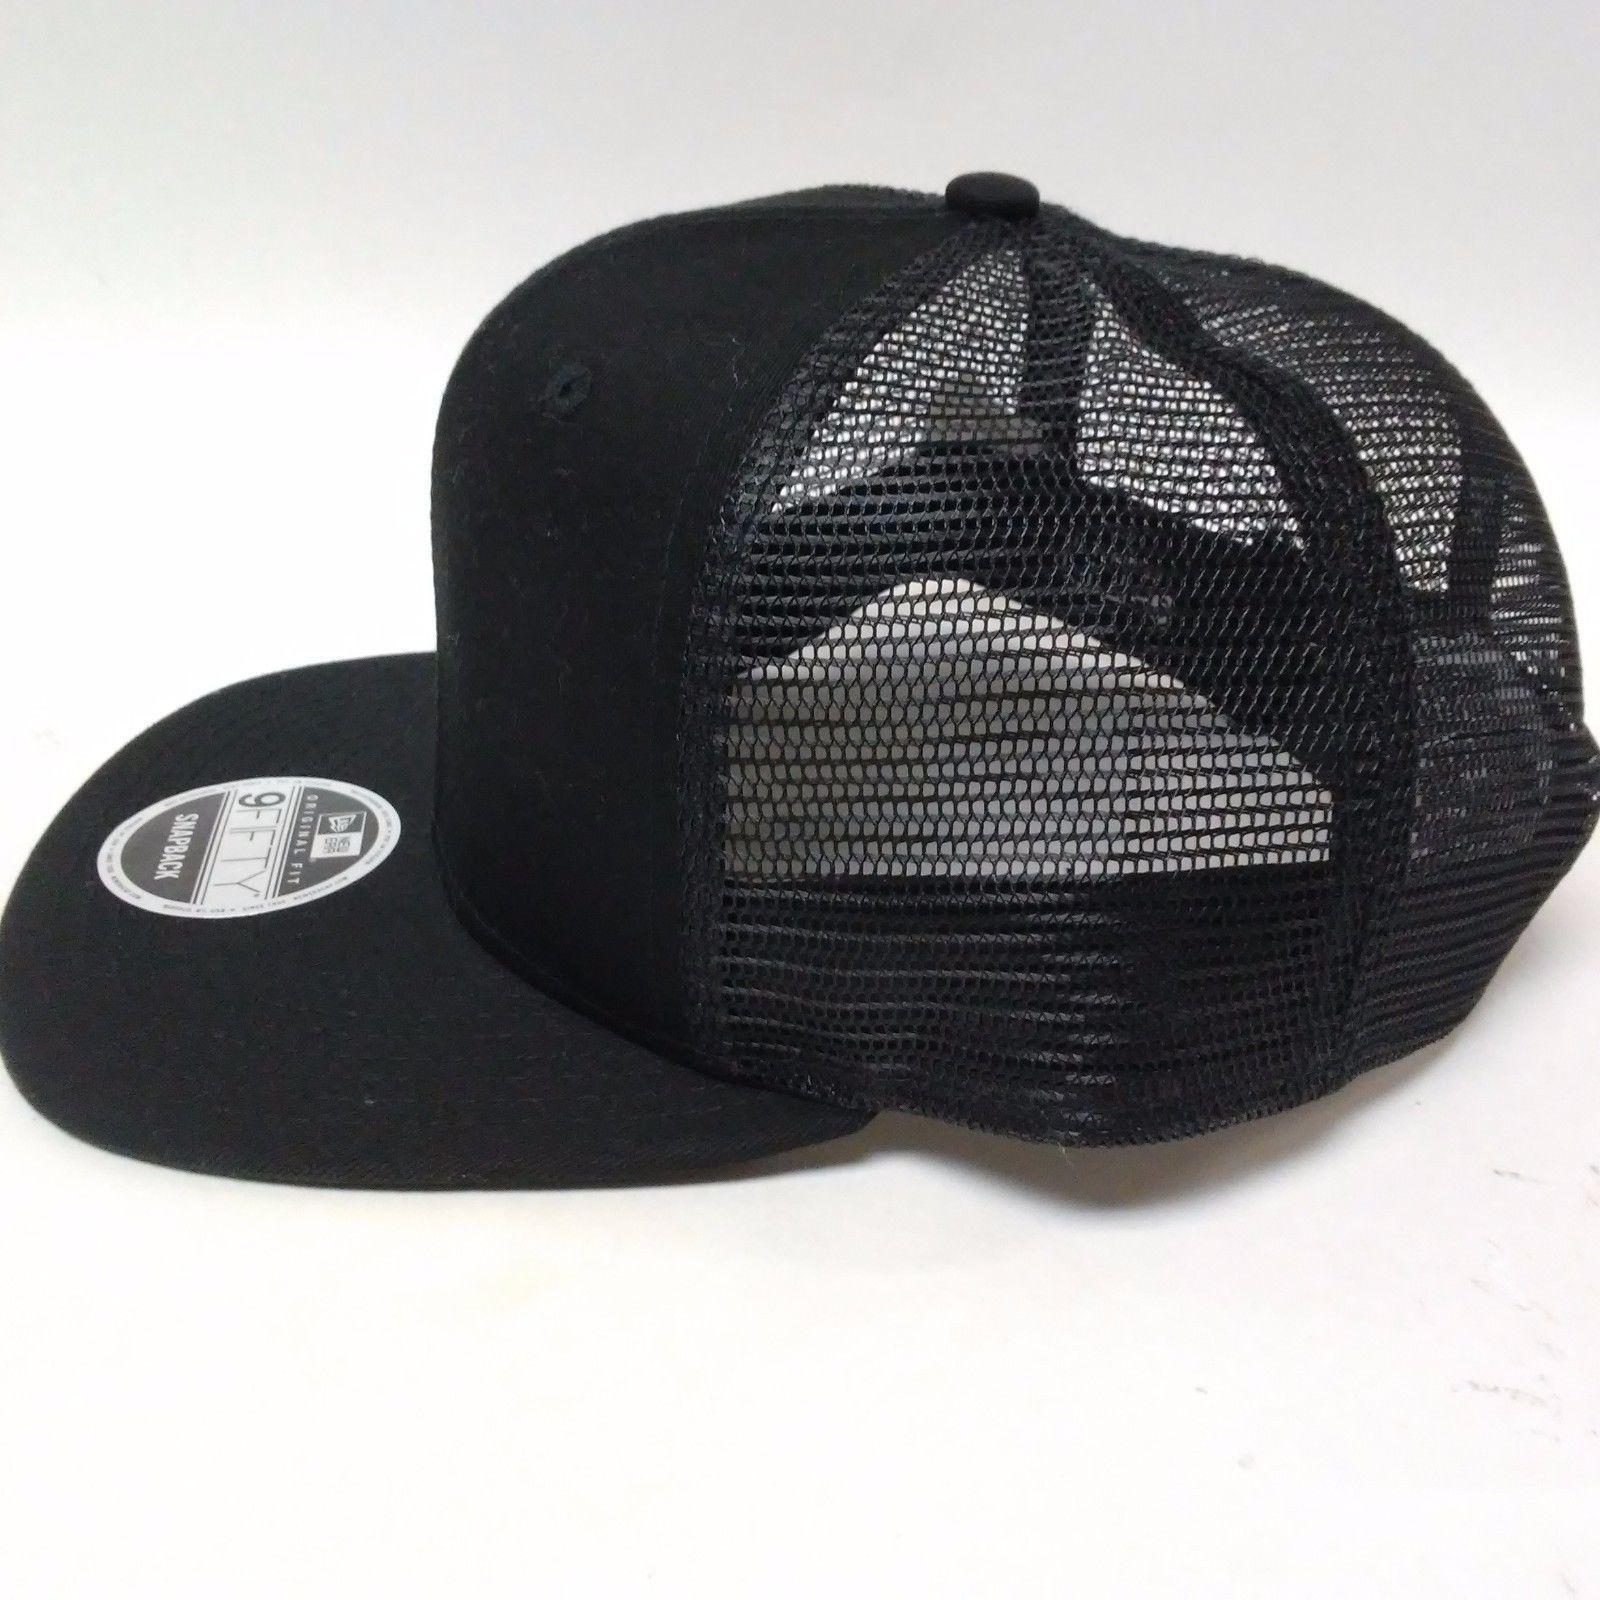 spain new era 9fifty snapback trucker cap blank black mesh flat 187d8 58ee7 9470d8445c79